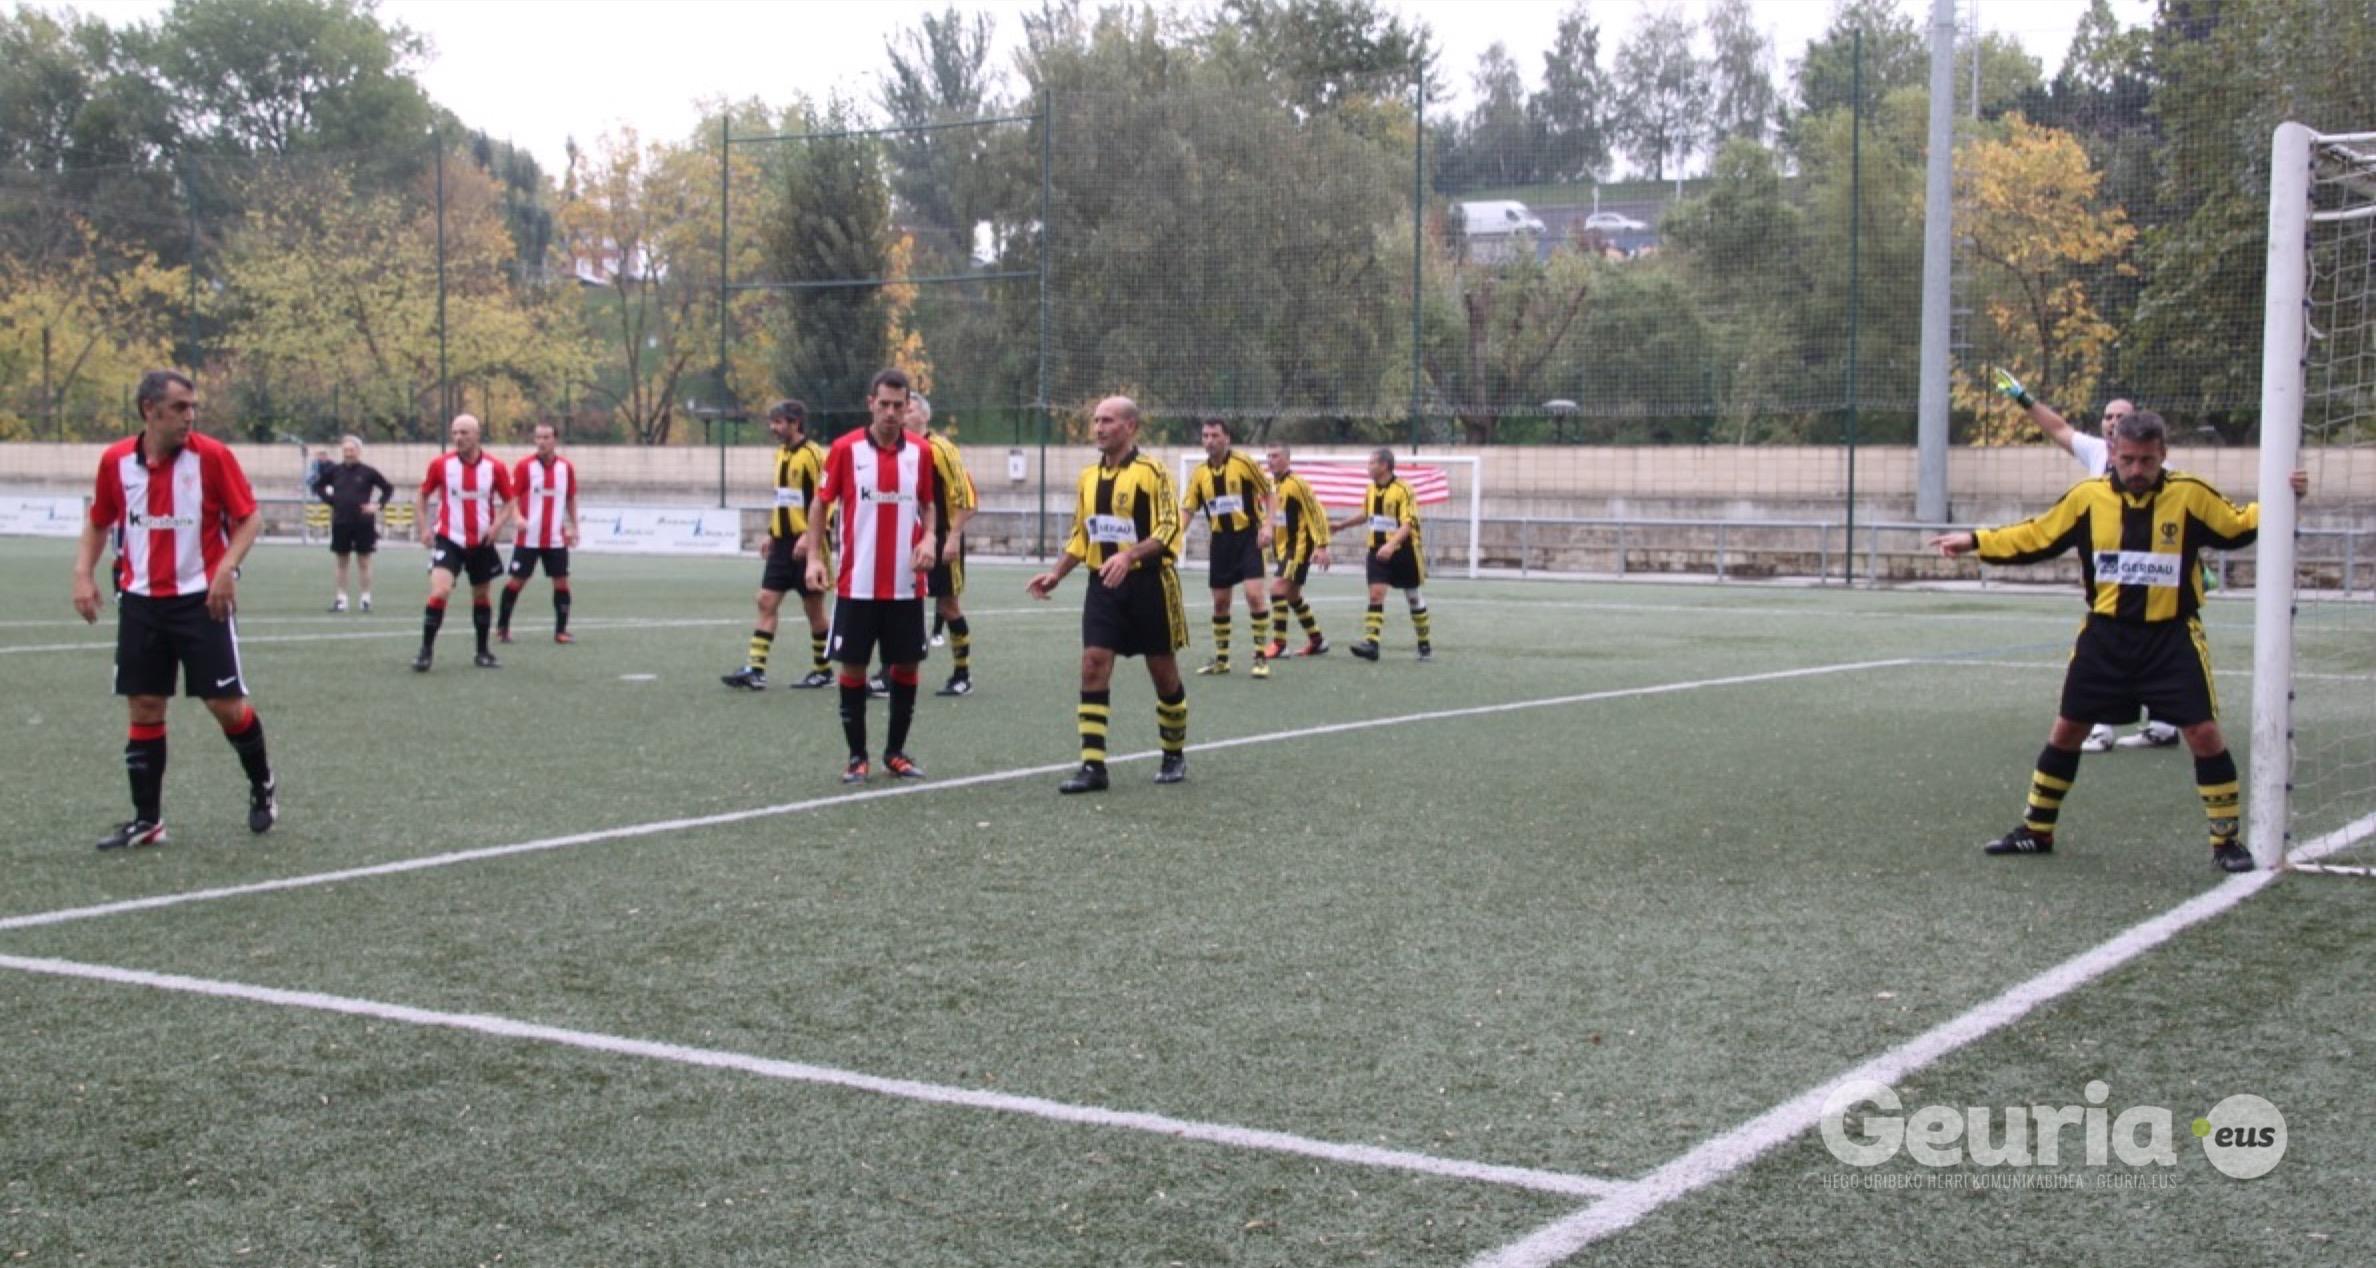 basauri_san_fausto_2015_futbol_basconia_beteranoak_5